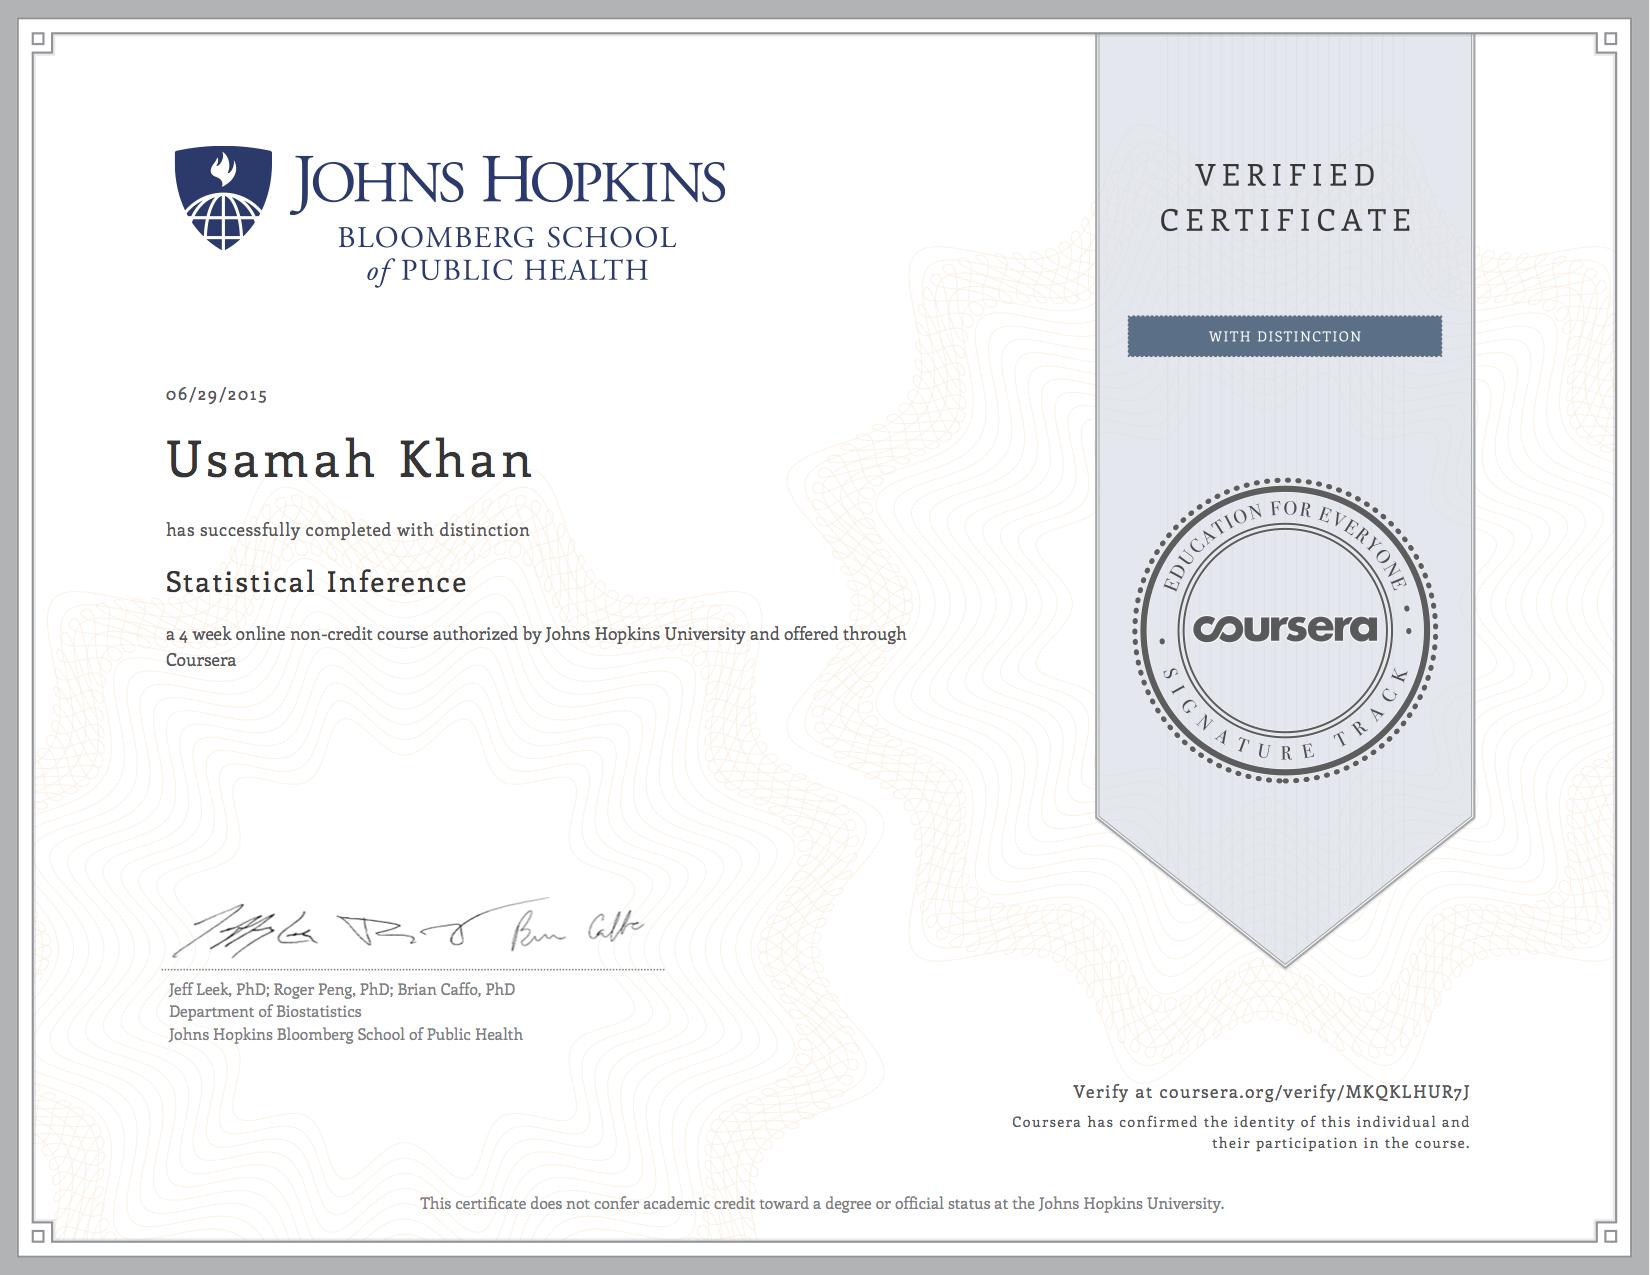 Coursera statinference 2016.jpg